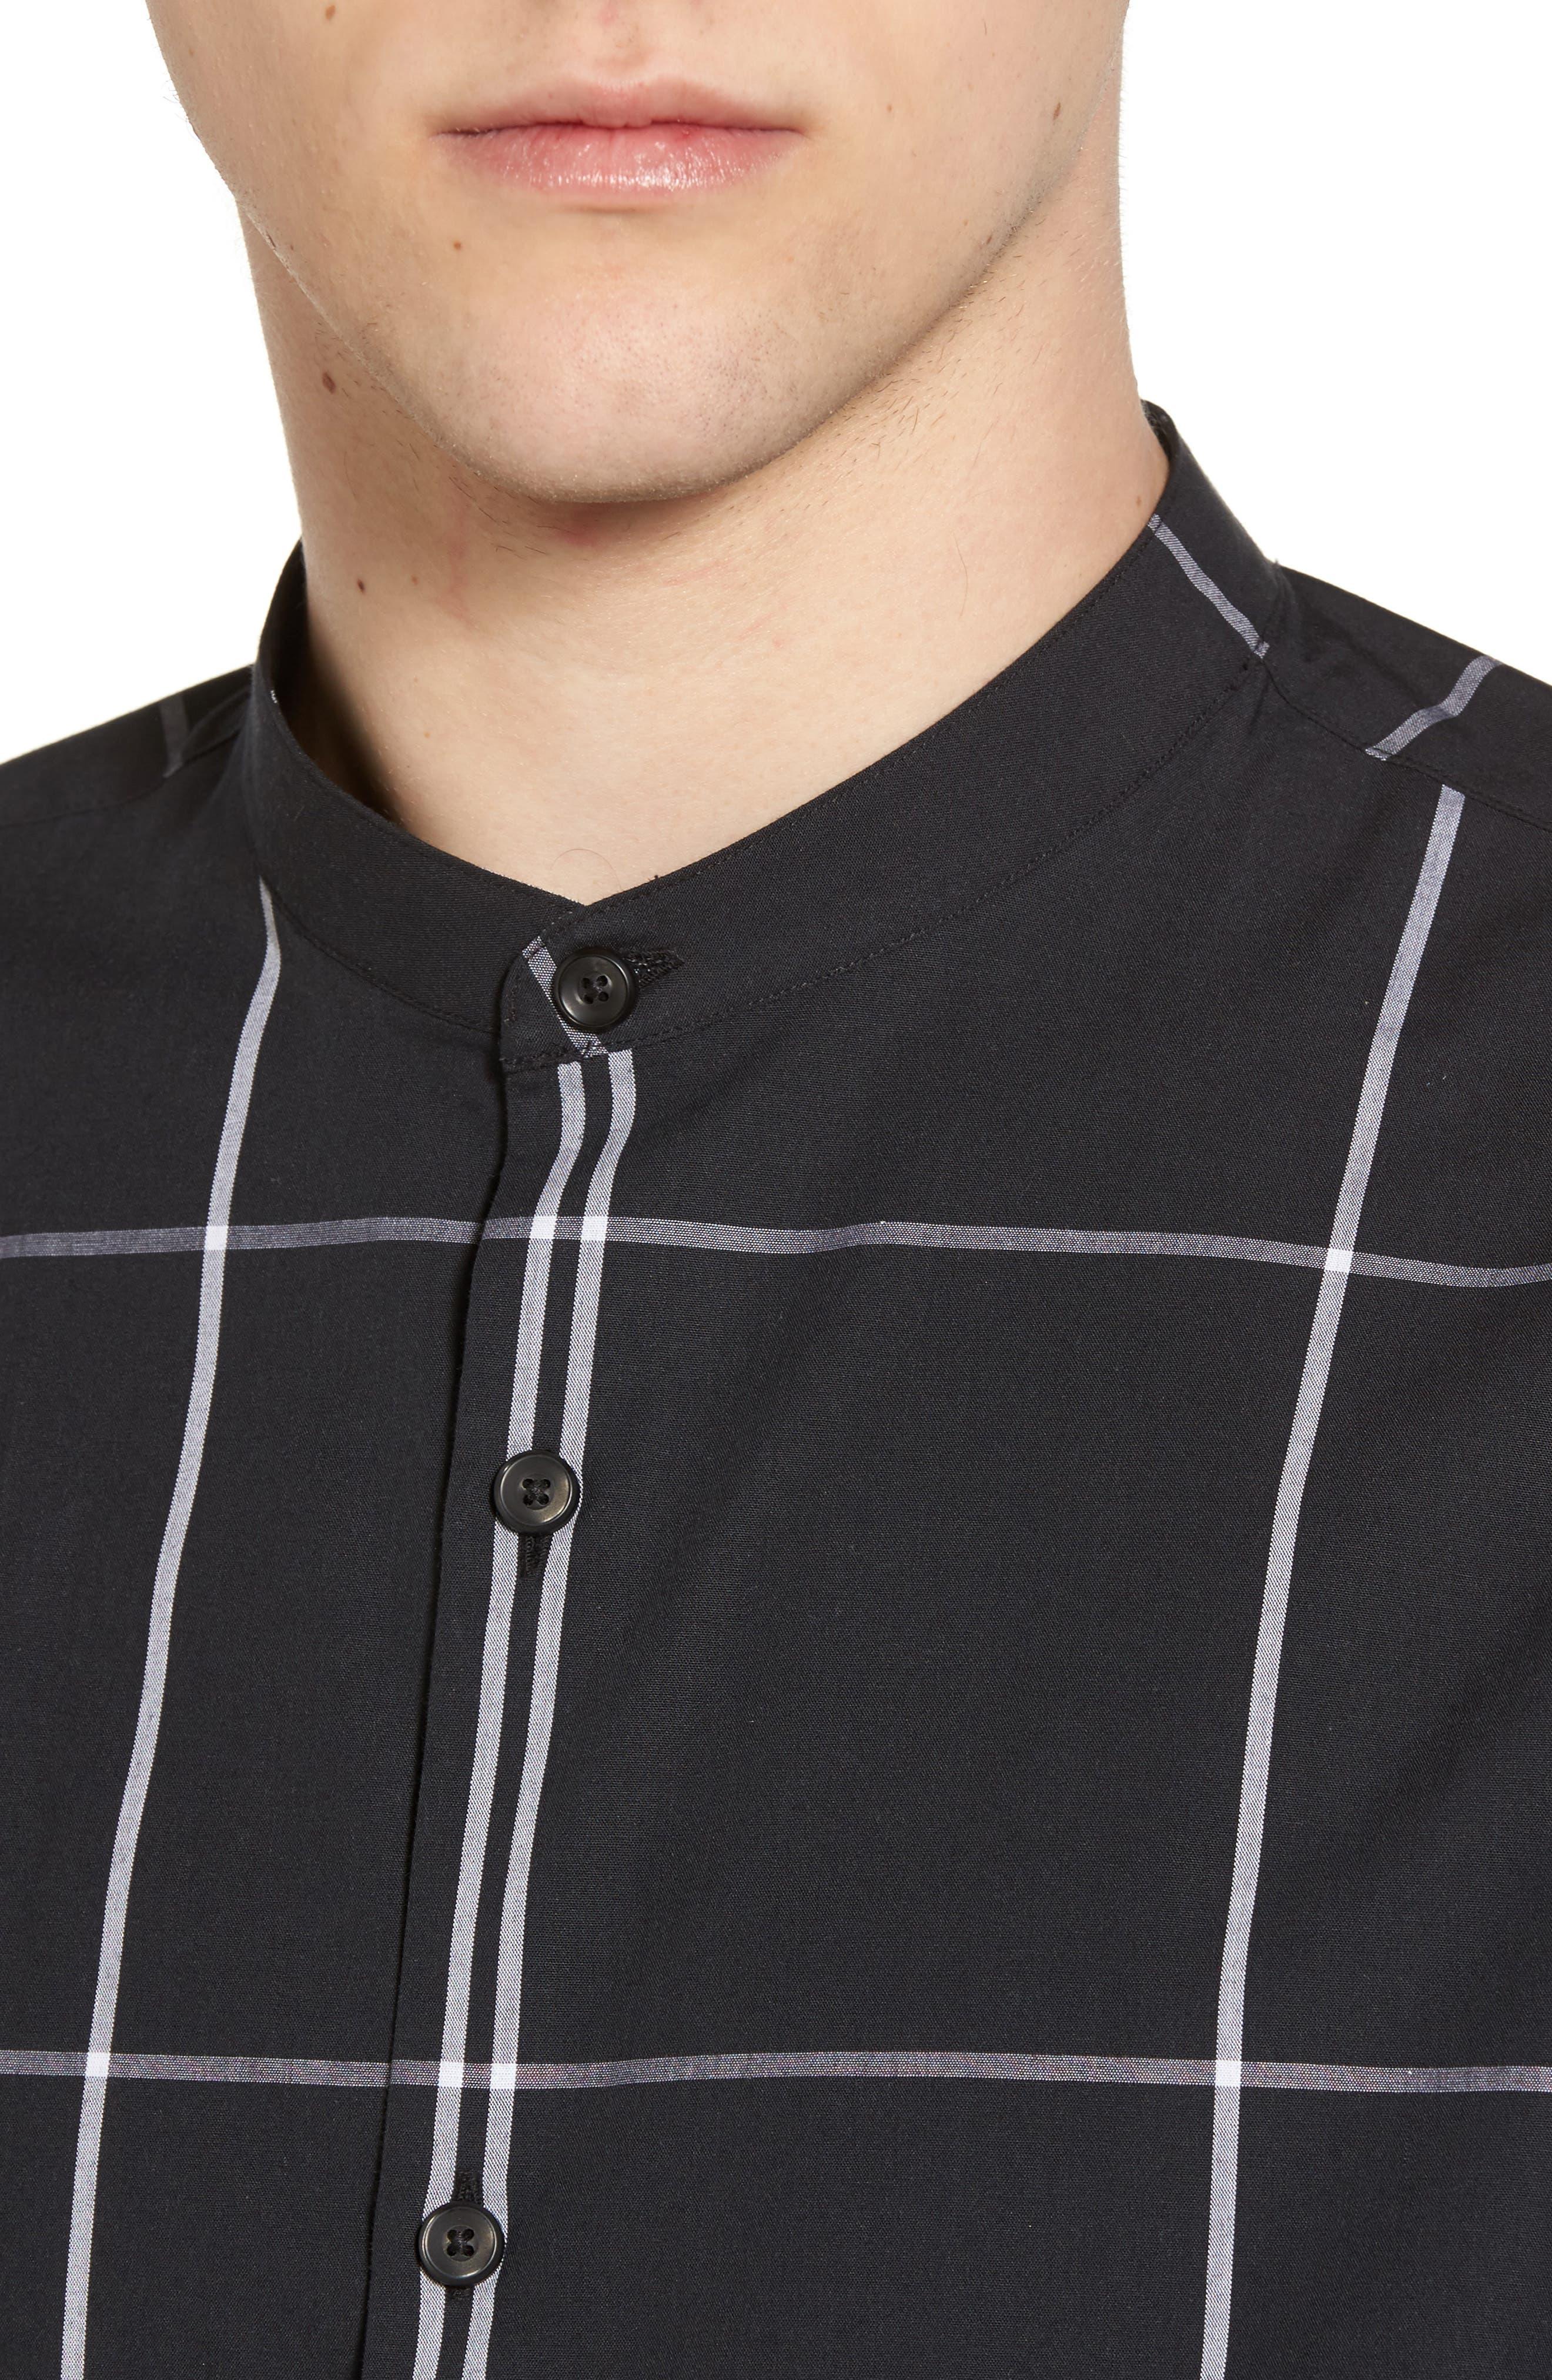 Trim Fit Windowpane Sport Shirt,                             Alternate thumbnail 2, color,                             Black Exploded Pane